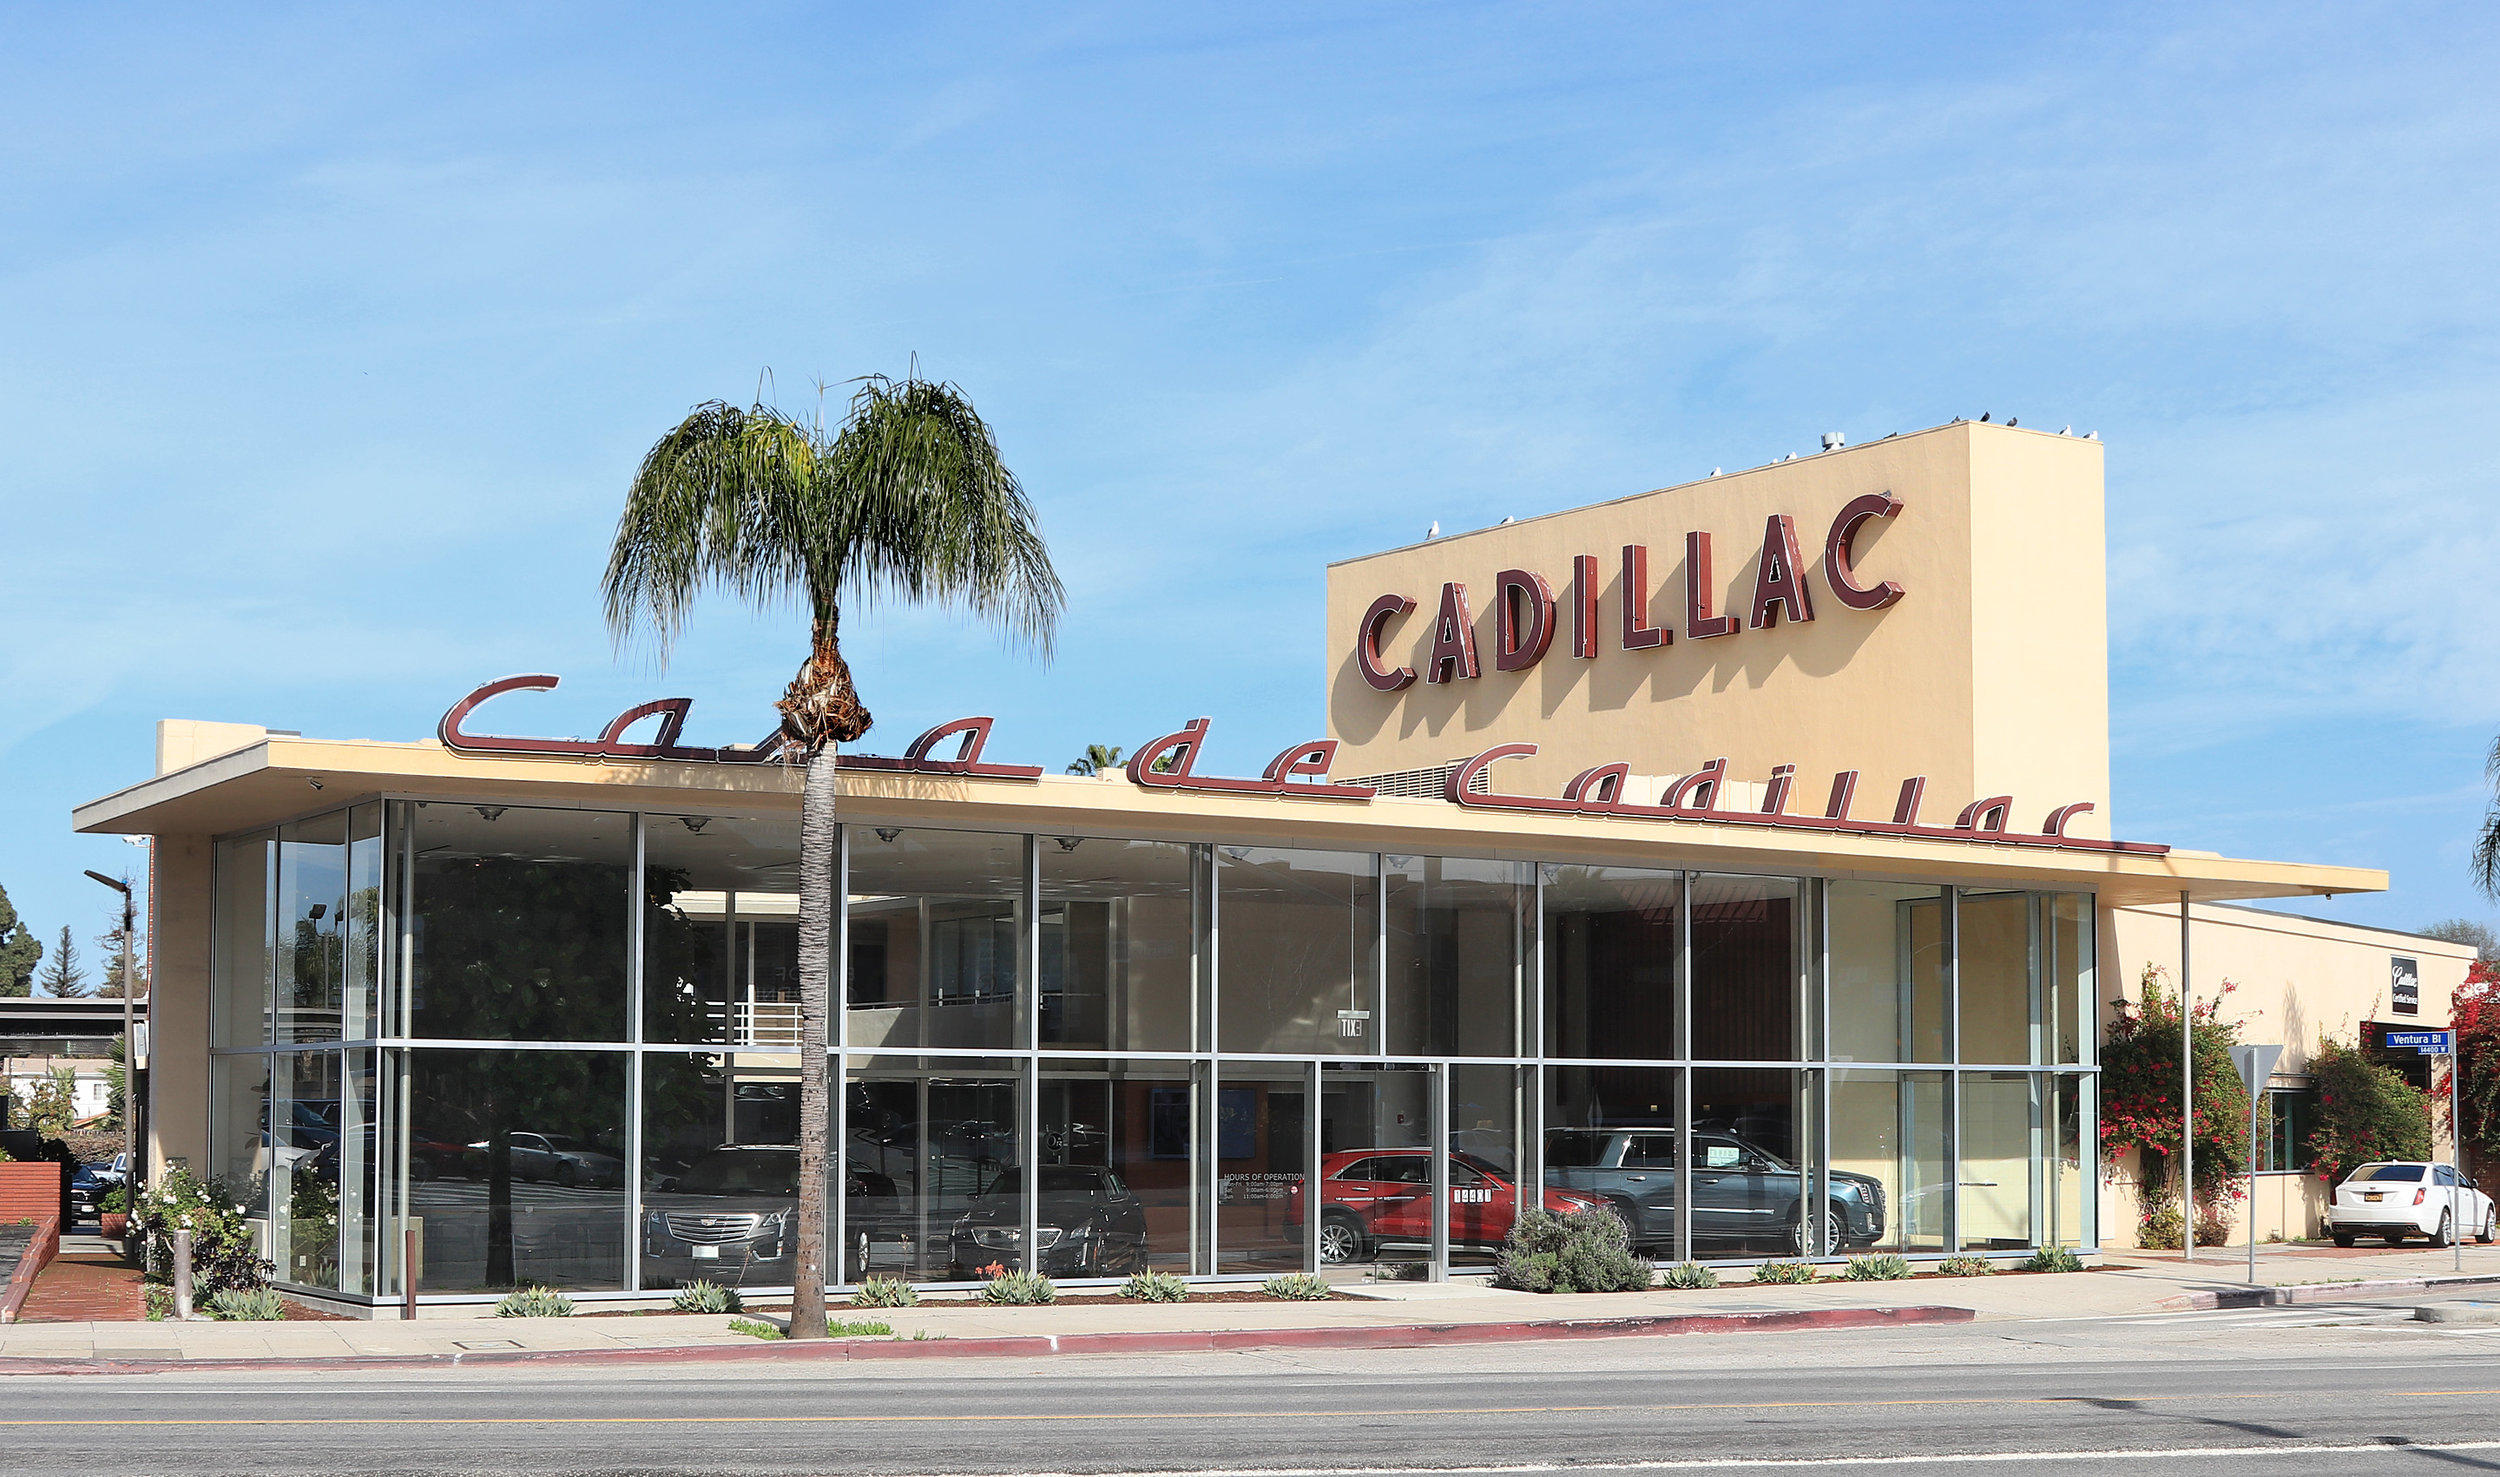 Casa De Cadillac    Randall Duell and Philip Conklin - 1949